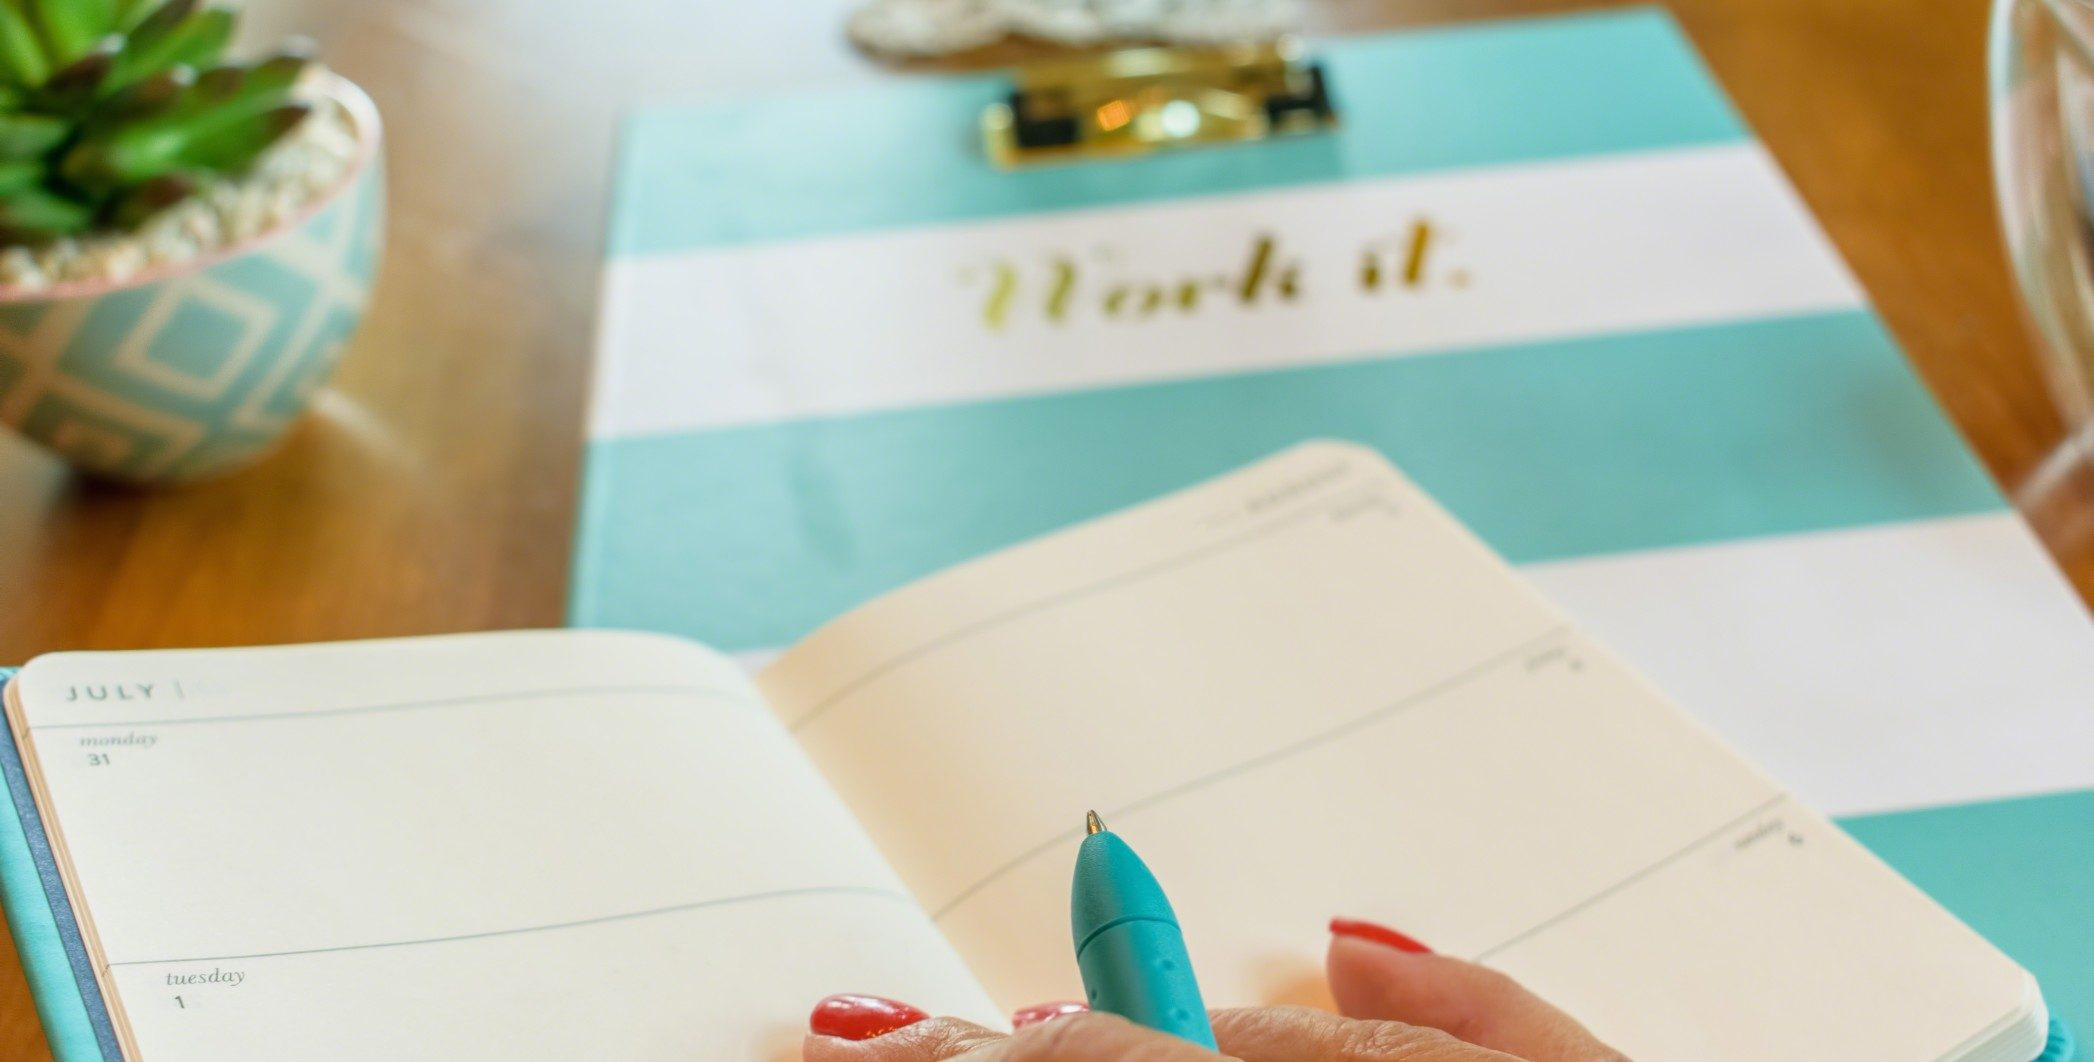 Conference Checklist: Planning a Balanced Agenda